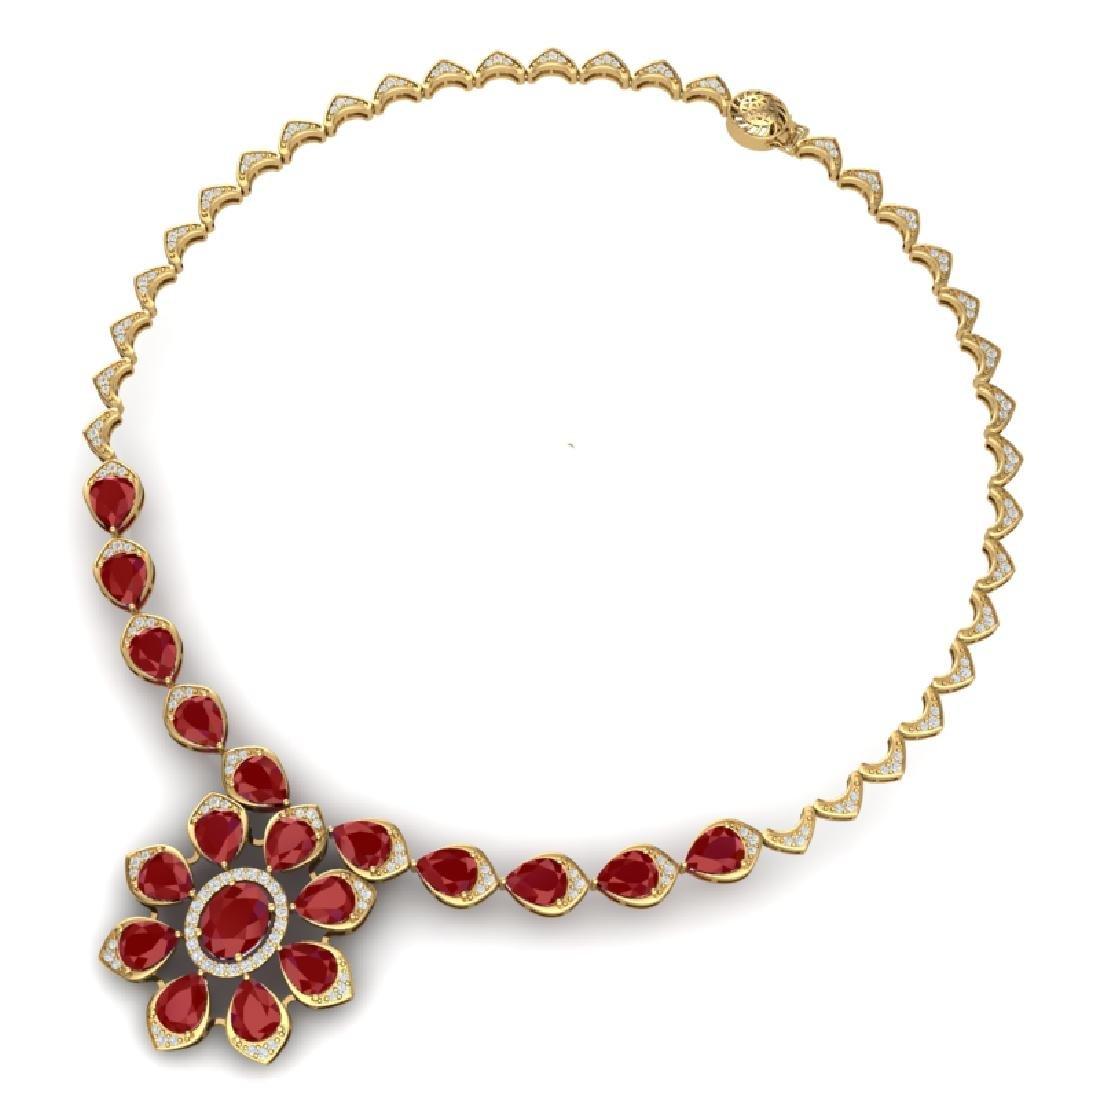 30.70 CTW Royalty Ruby & VS Diamond Necklace 18K Yellow - 3